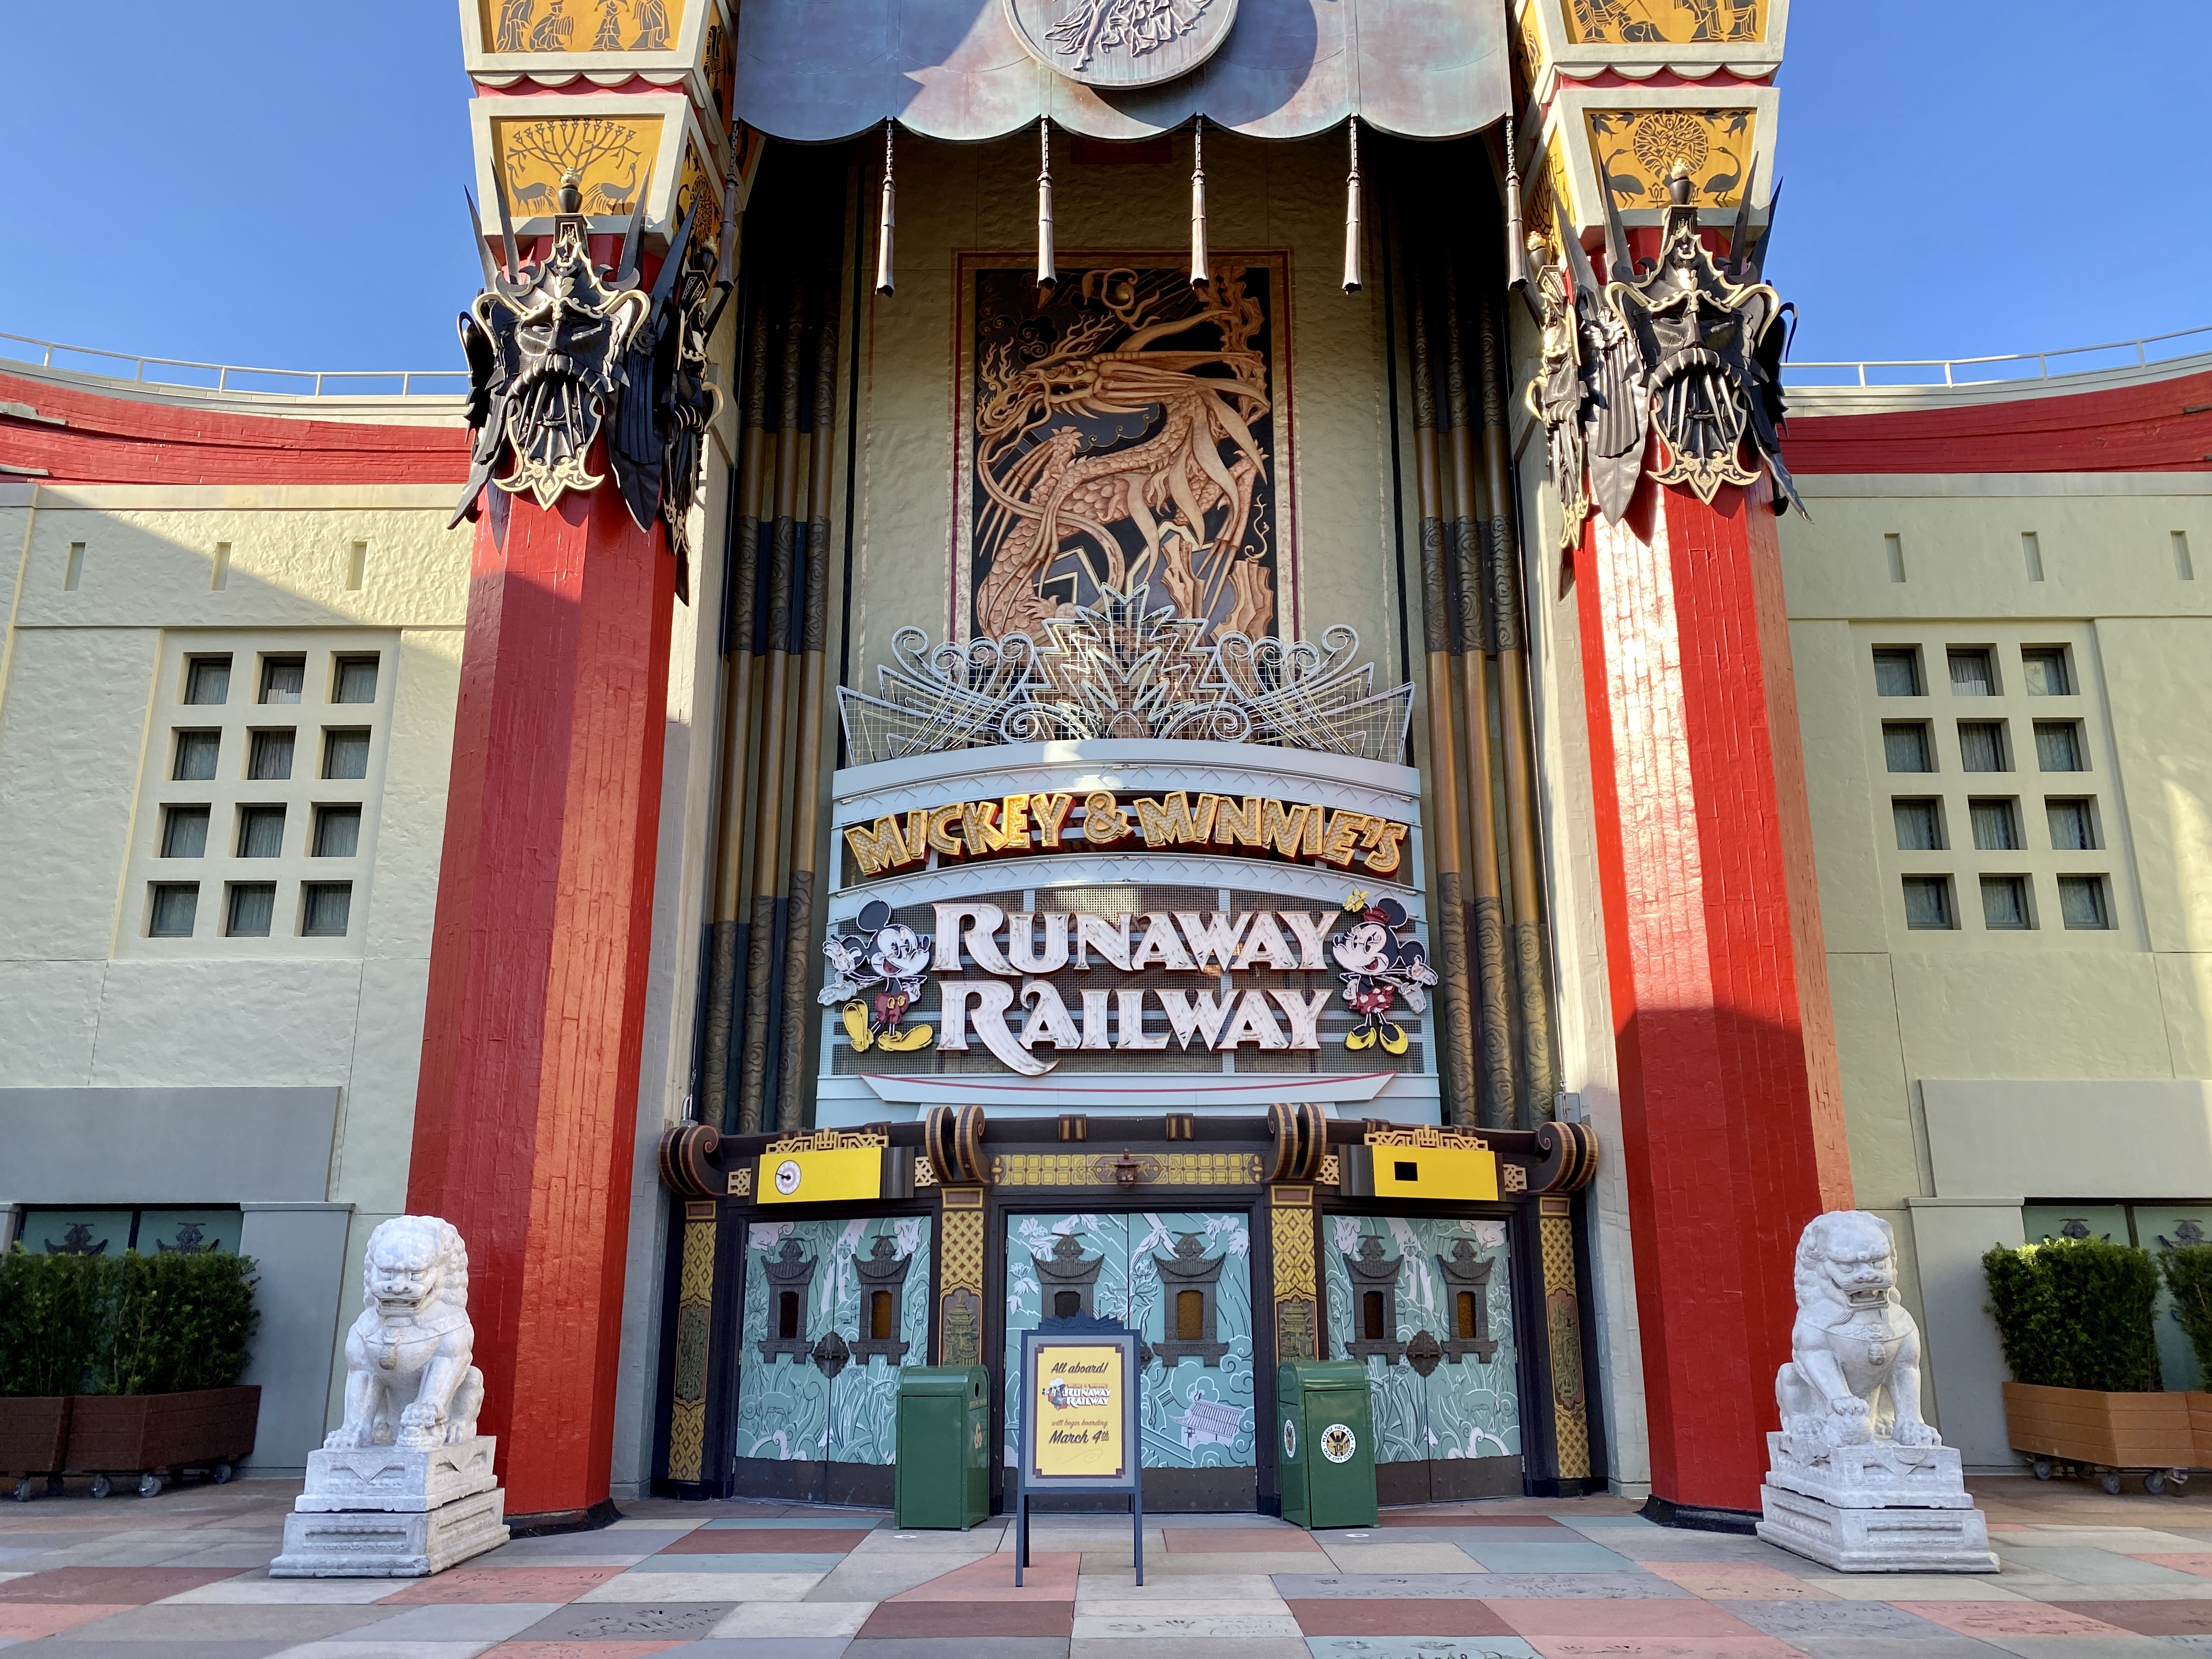 Mickey Mouse runaway railway